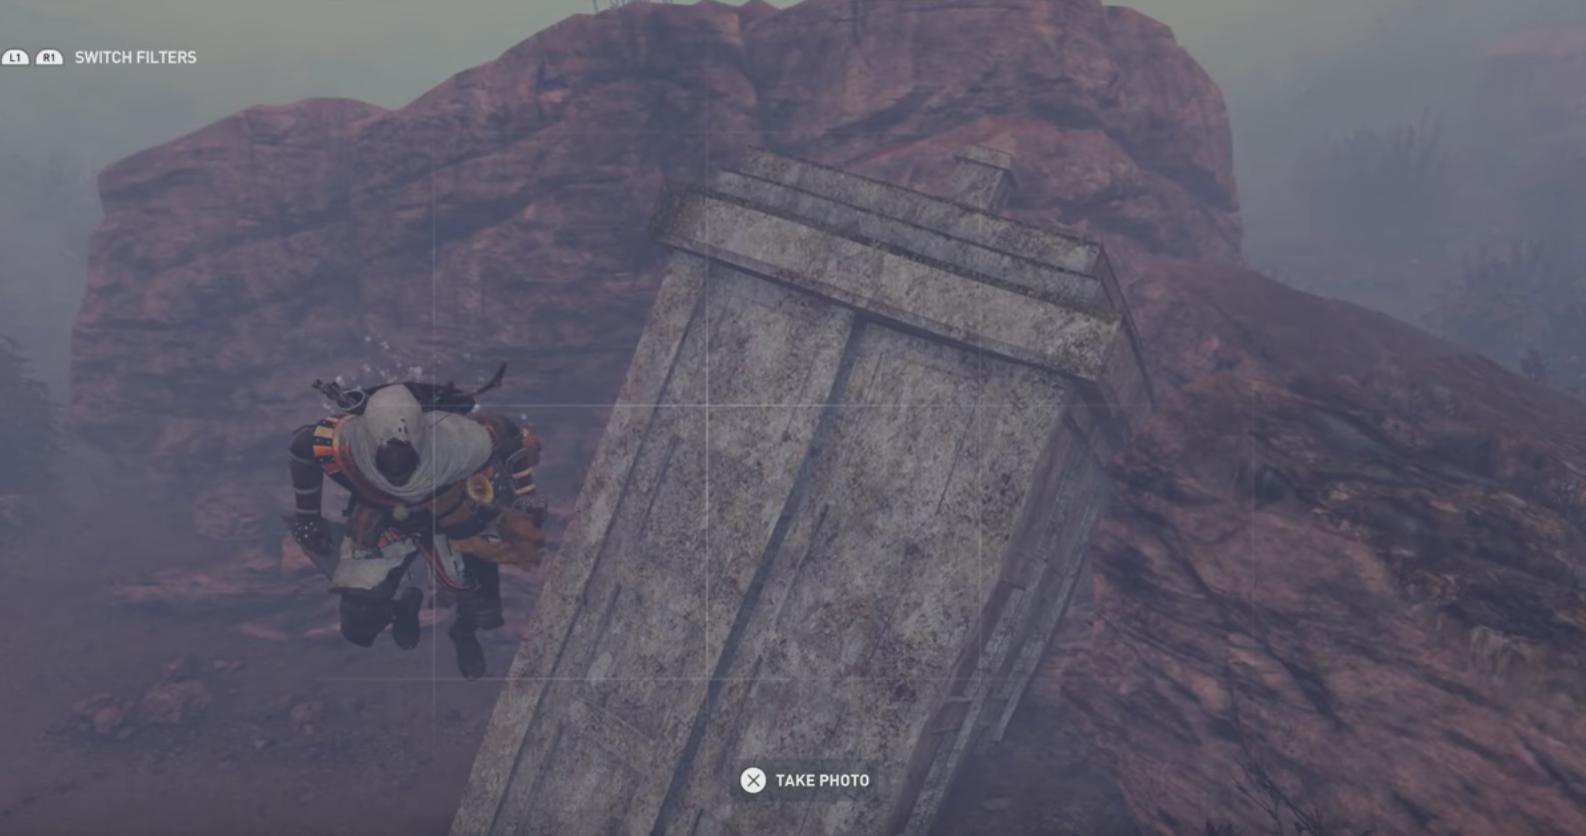 Doctor Who Easter Egg in Assassin's Creed Origins (YouTube. JG)